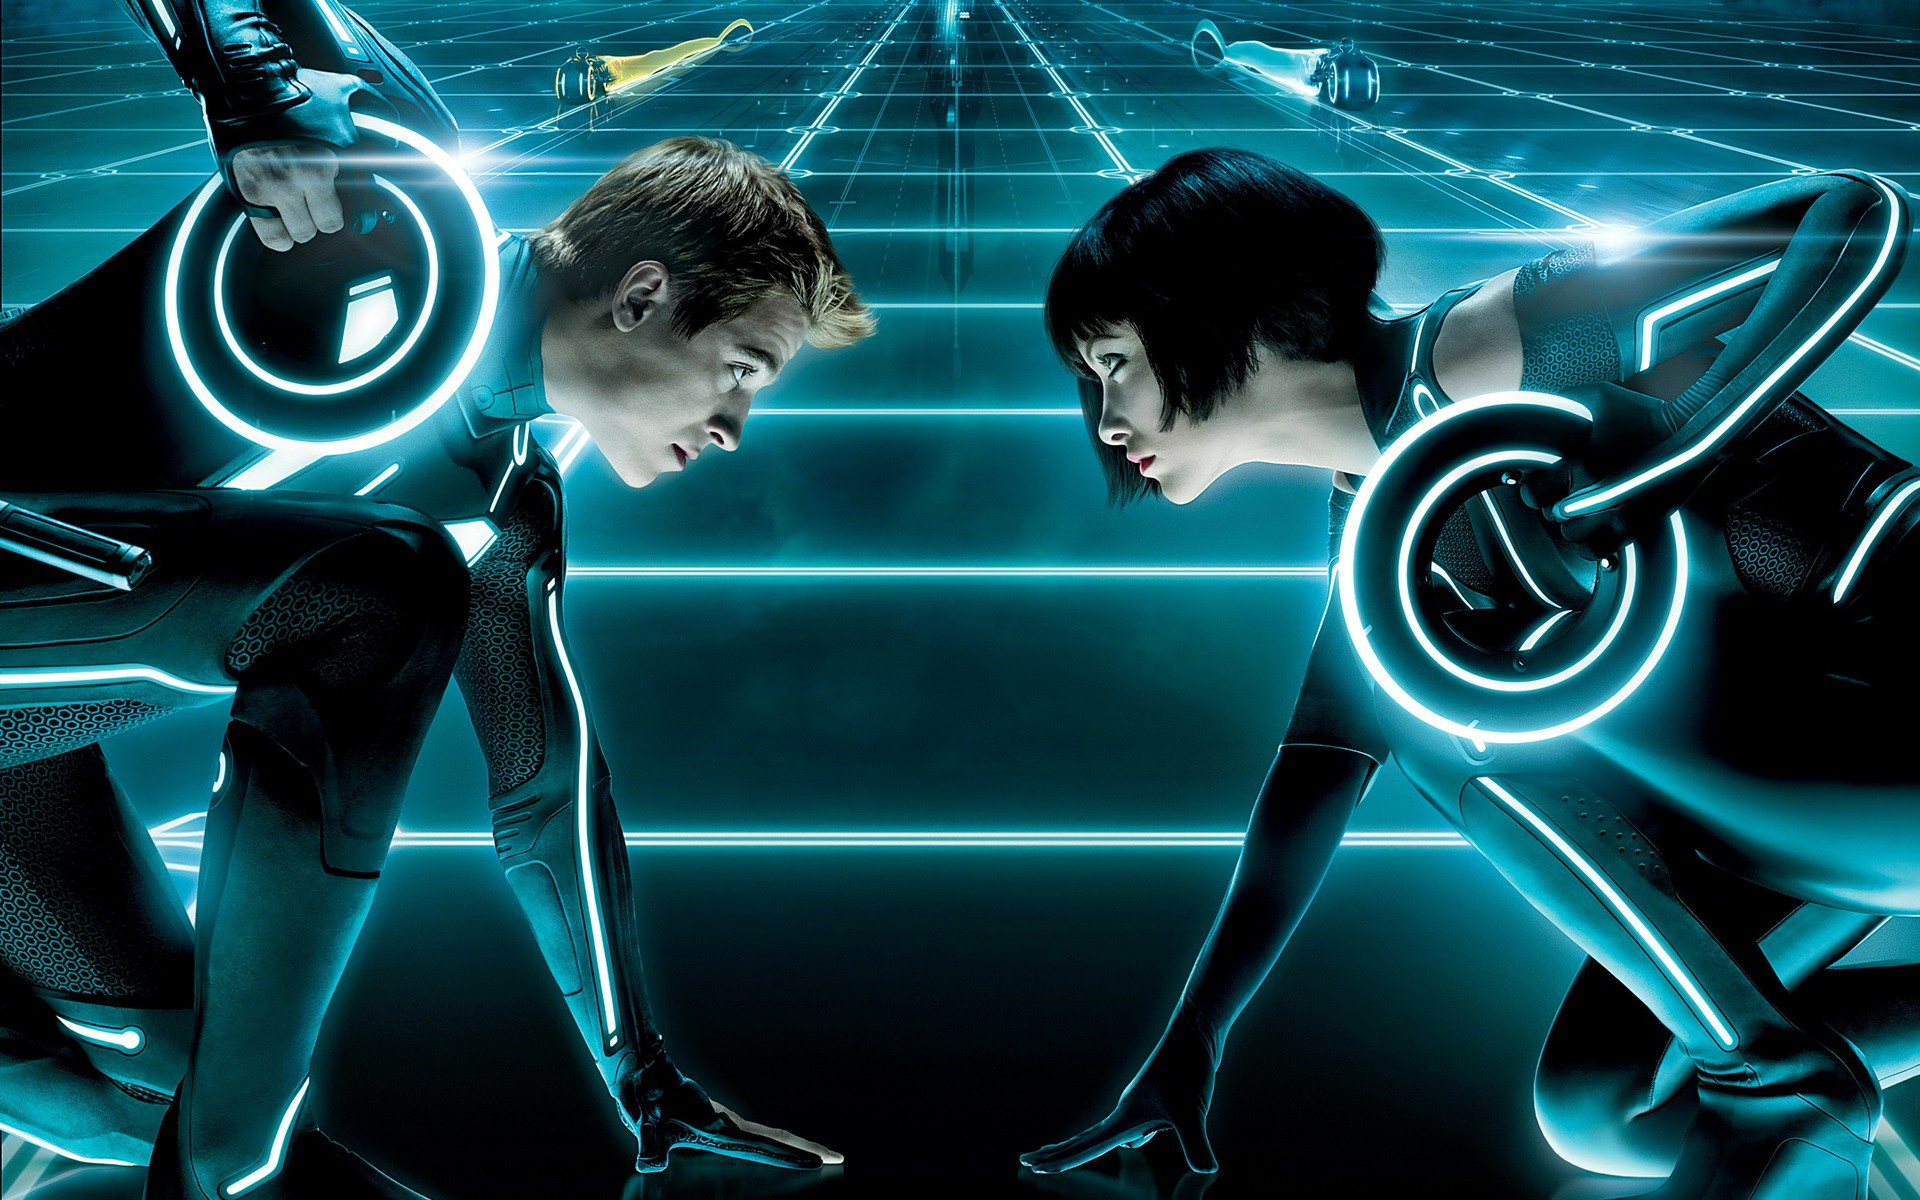 third tron movie still possible plot details revealed film